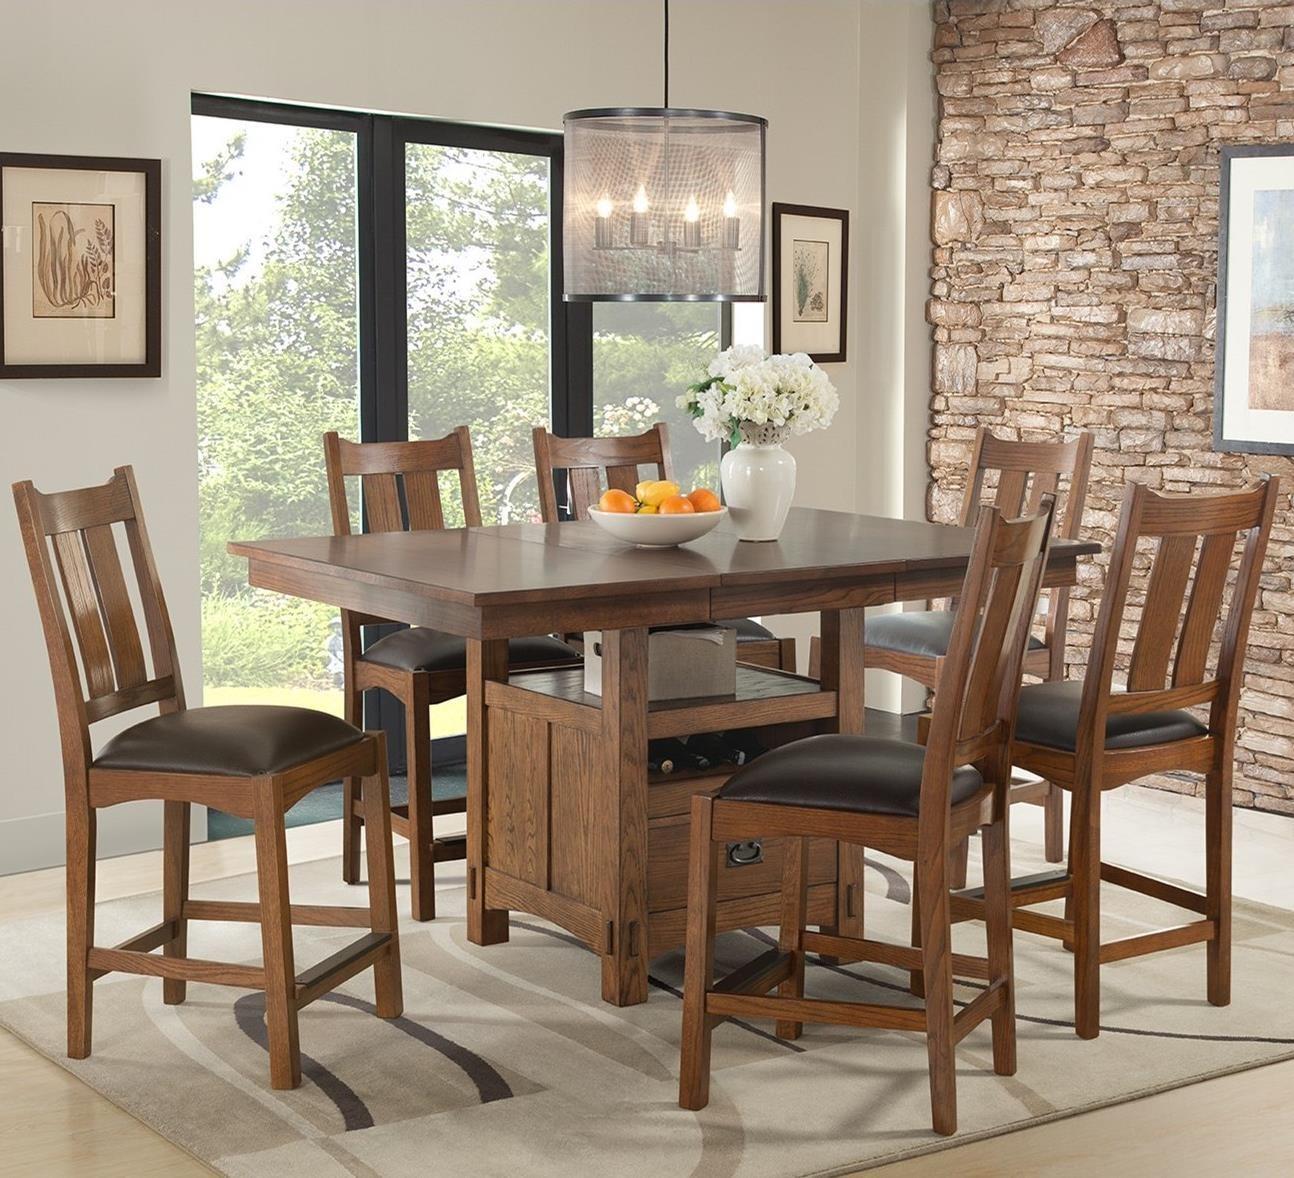 Intercon Oak Park 7 Piece Counter Height Dining Set - Item Number: OP-TA-4866G-MIS-C+6xBS-950C-MIS-K24